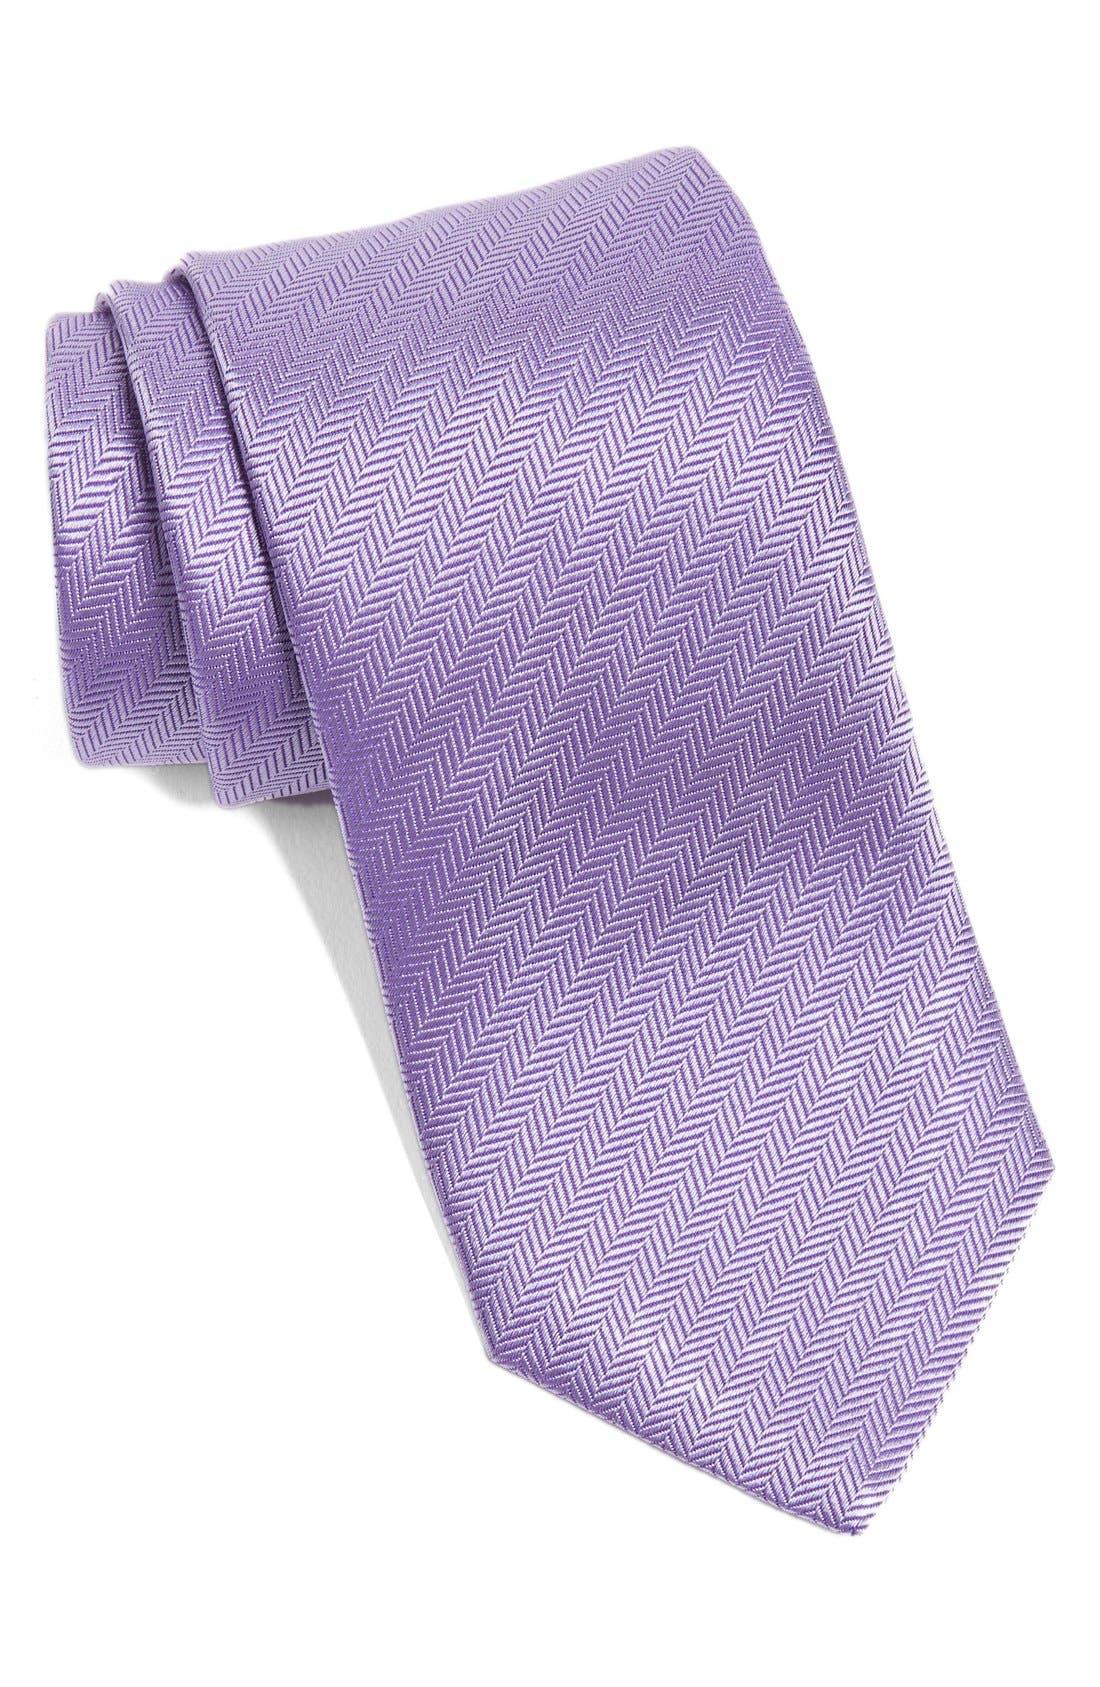 Herringbone Textured Silk Tie,                             Main thumbnail 1, color,                             LAVENDER